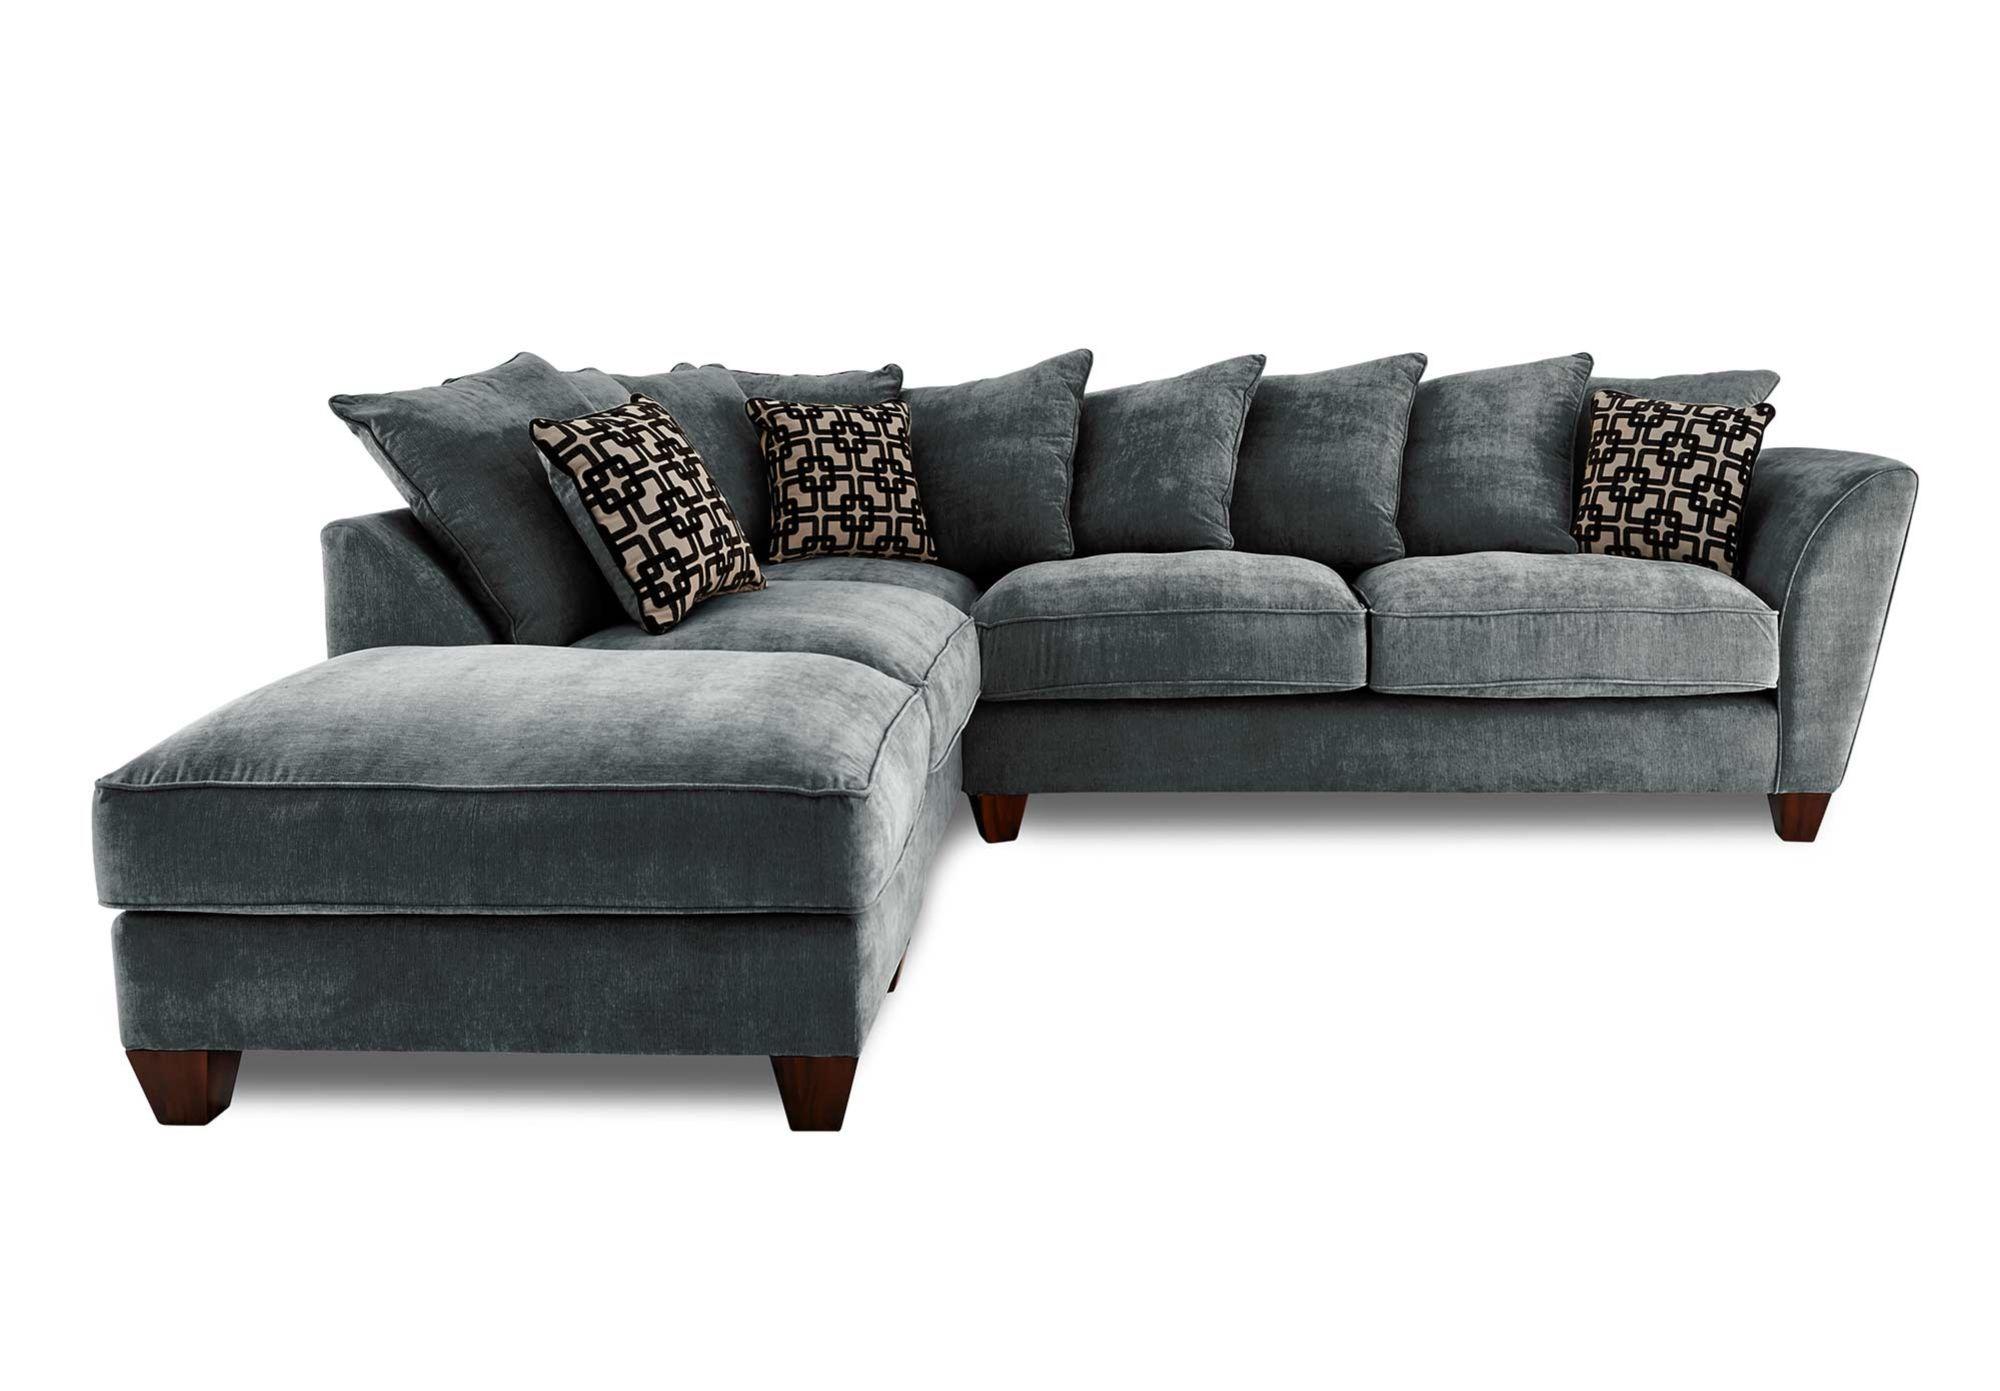 Fable Corner Sofa Furniture Village Refurbish Leather Lhf Scatter Back Tangier Gorgeous Living